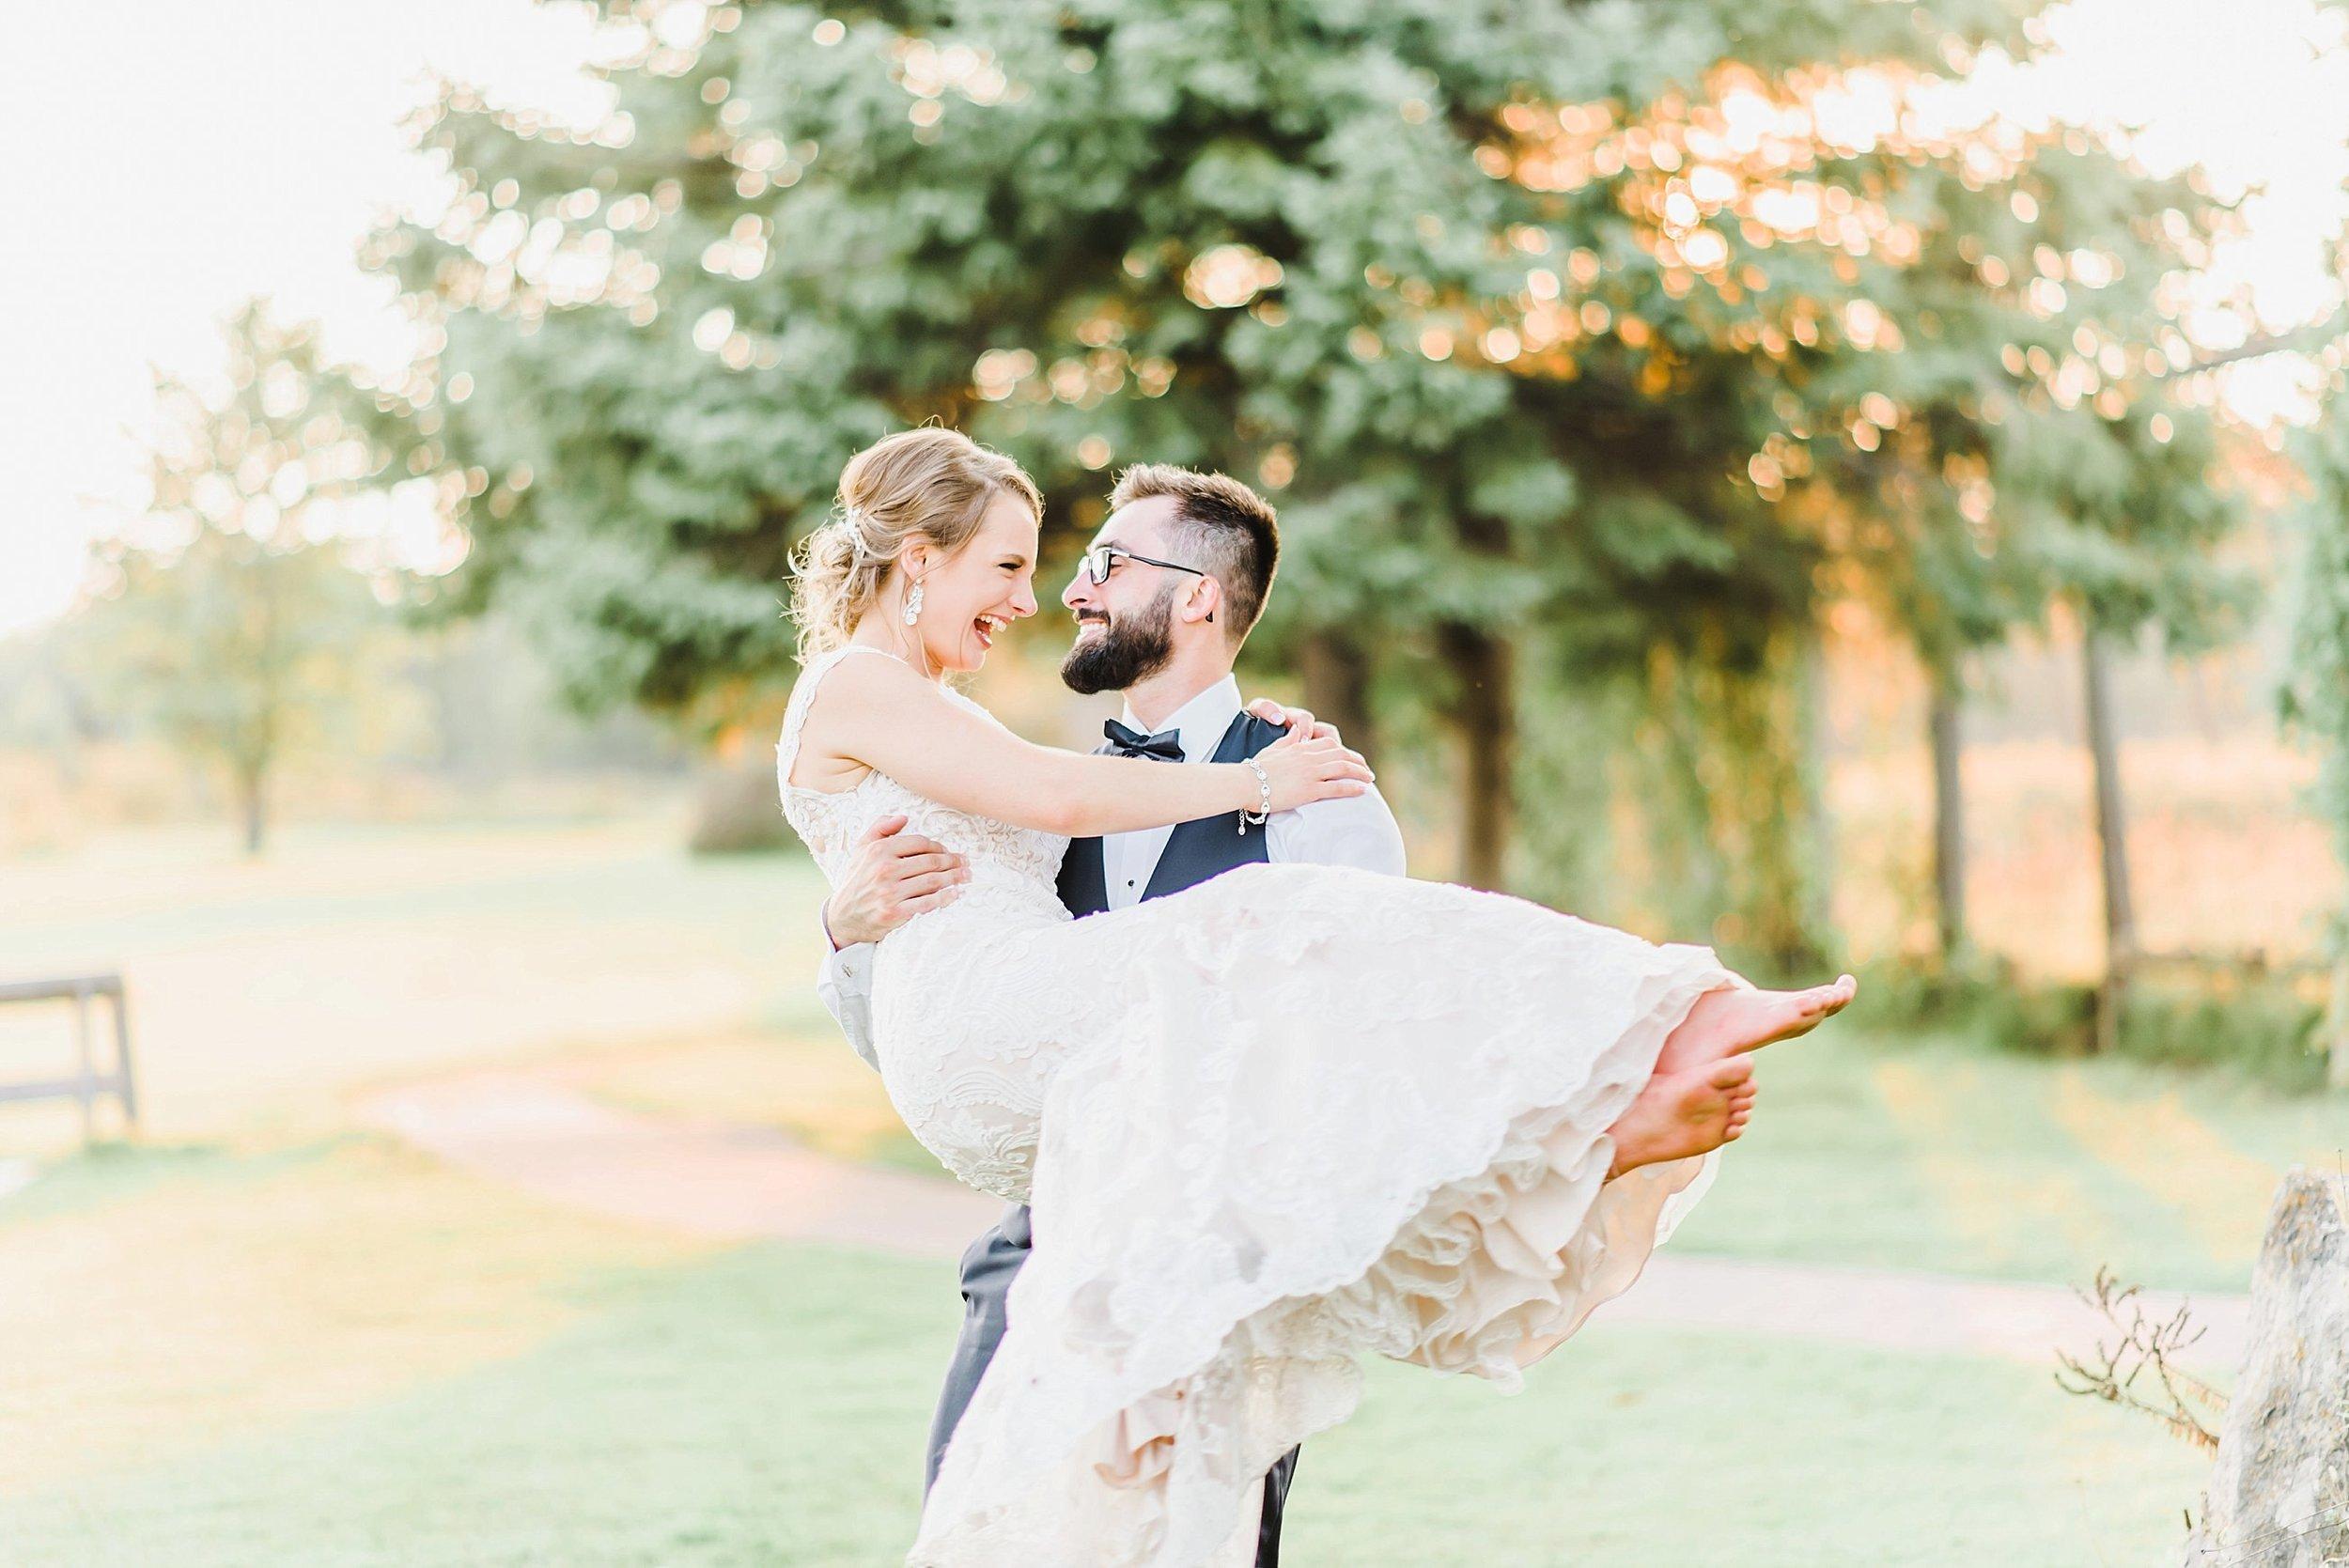 light airy indie fine art ottawa wedding photographer | Ali and Batoul Photography_1347.jpg